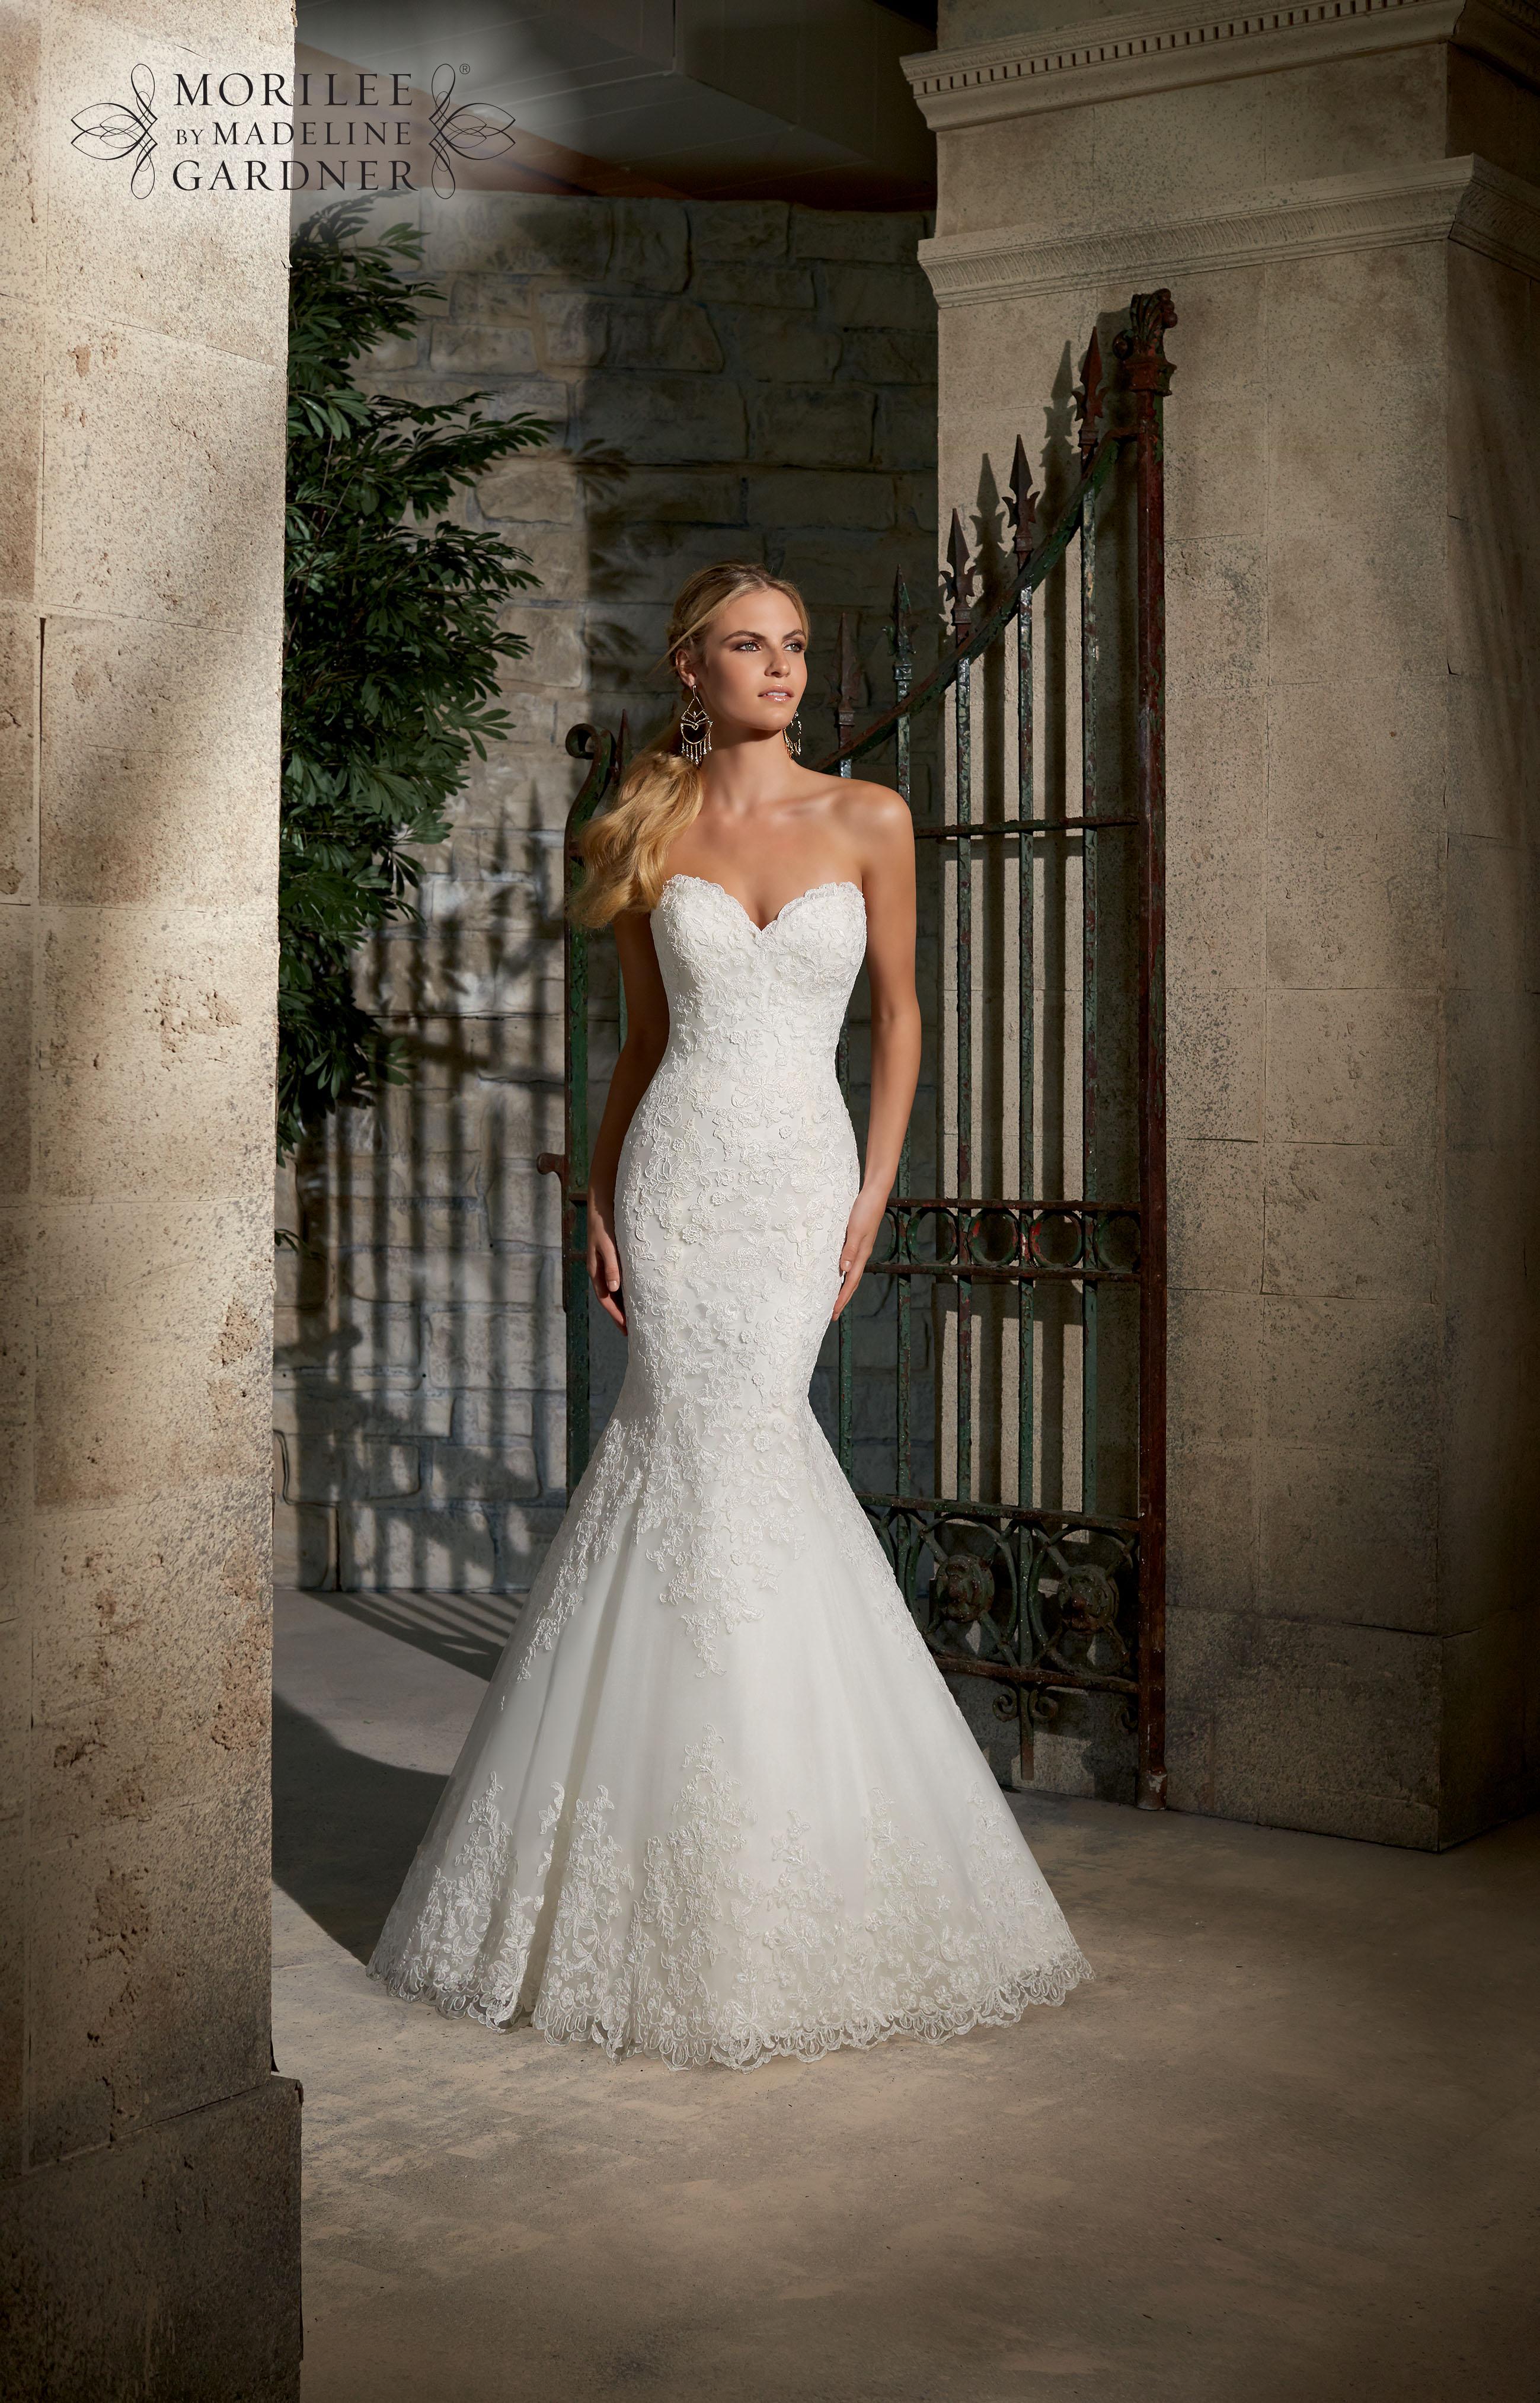 31b307ece0 Mori Lee Strapless Mermaid Wedding Dress - Gomes Weine AG